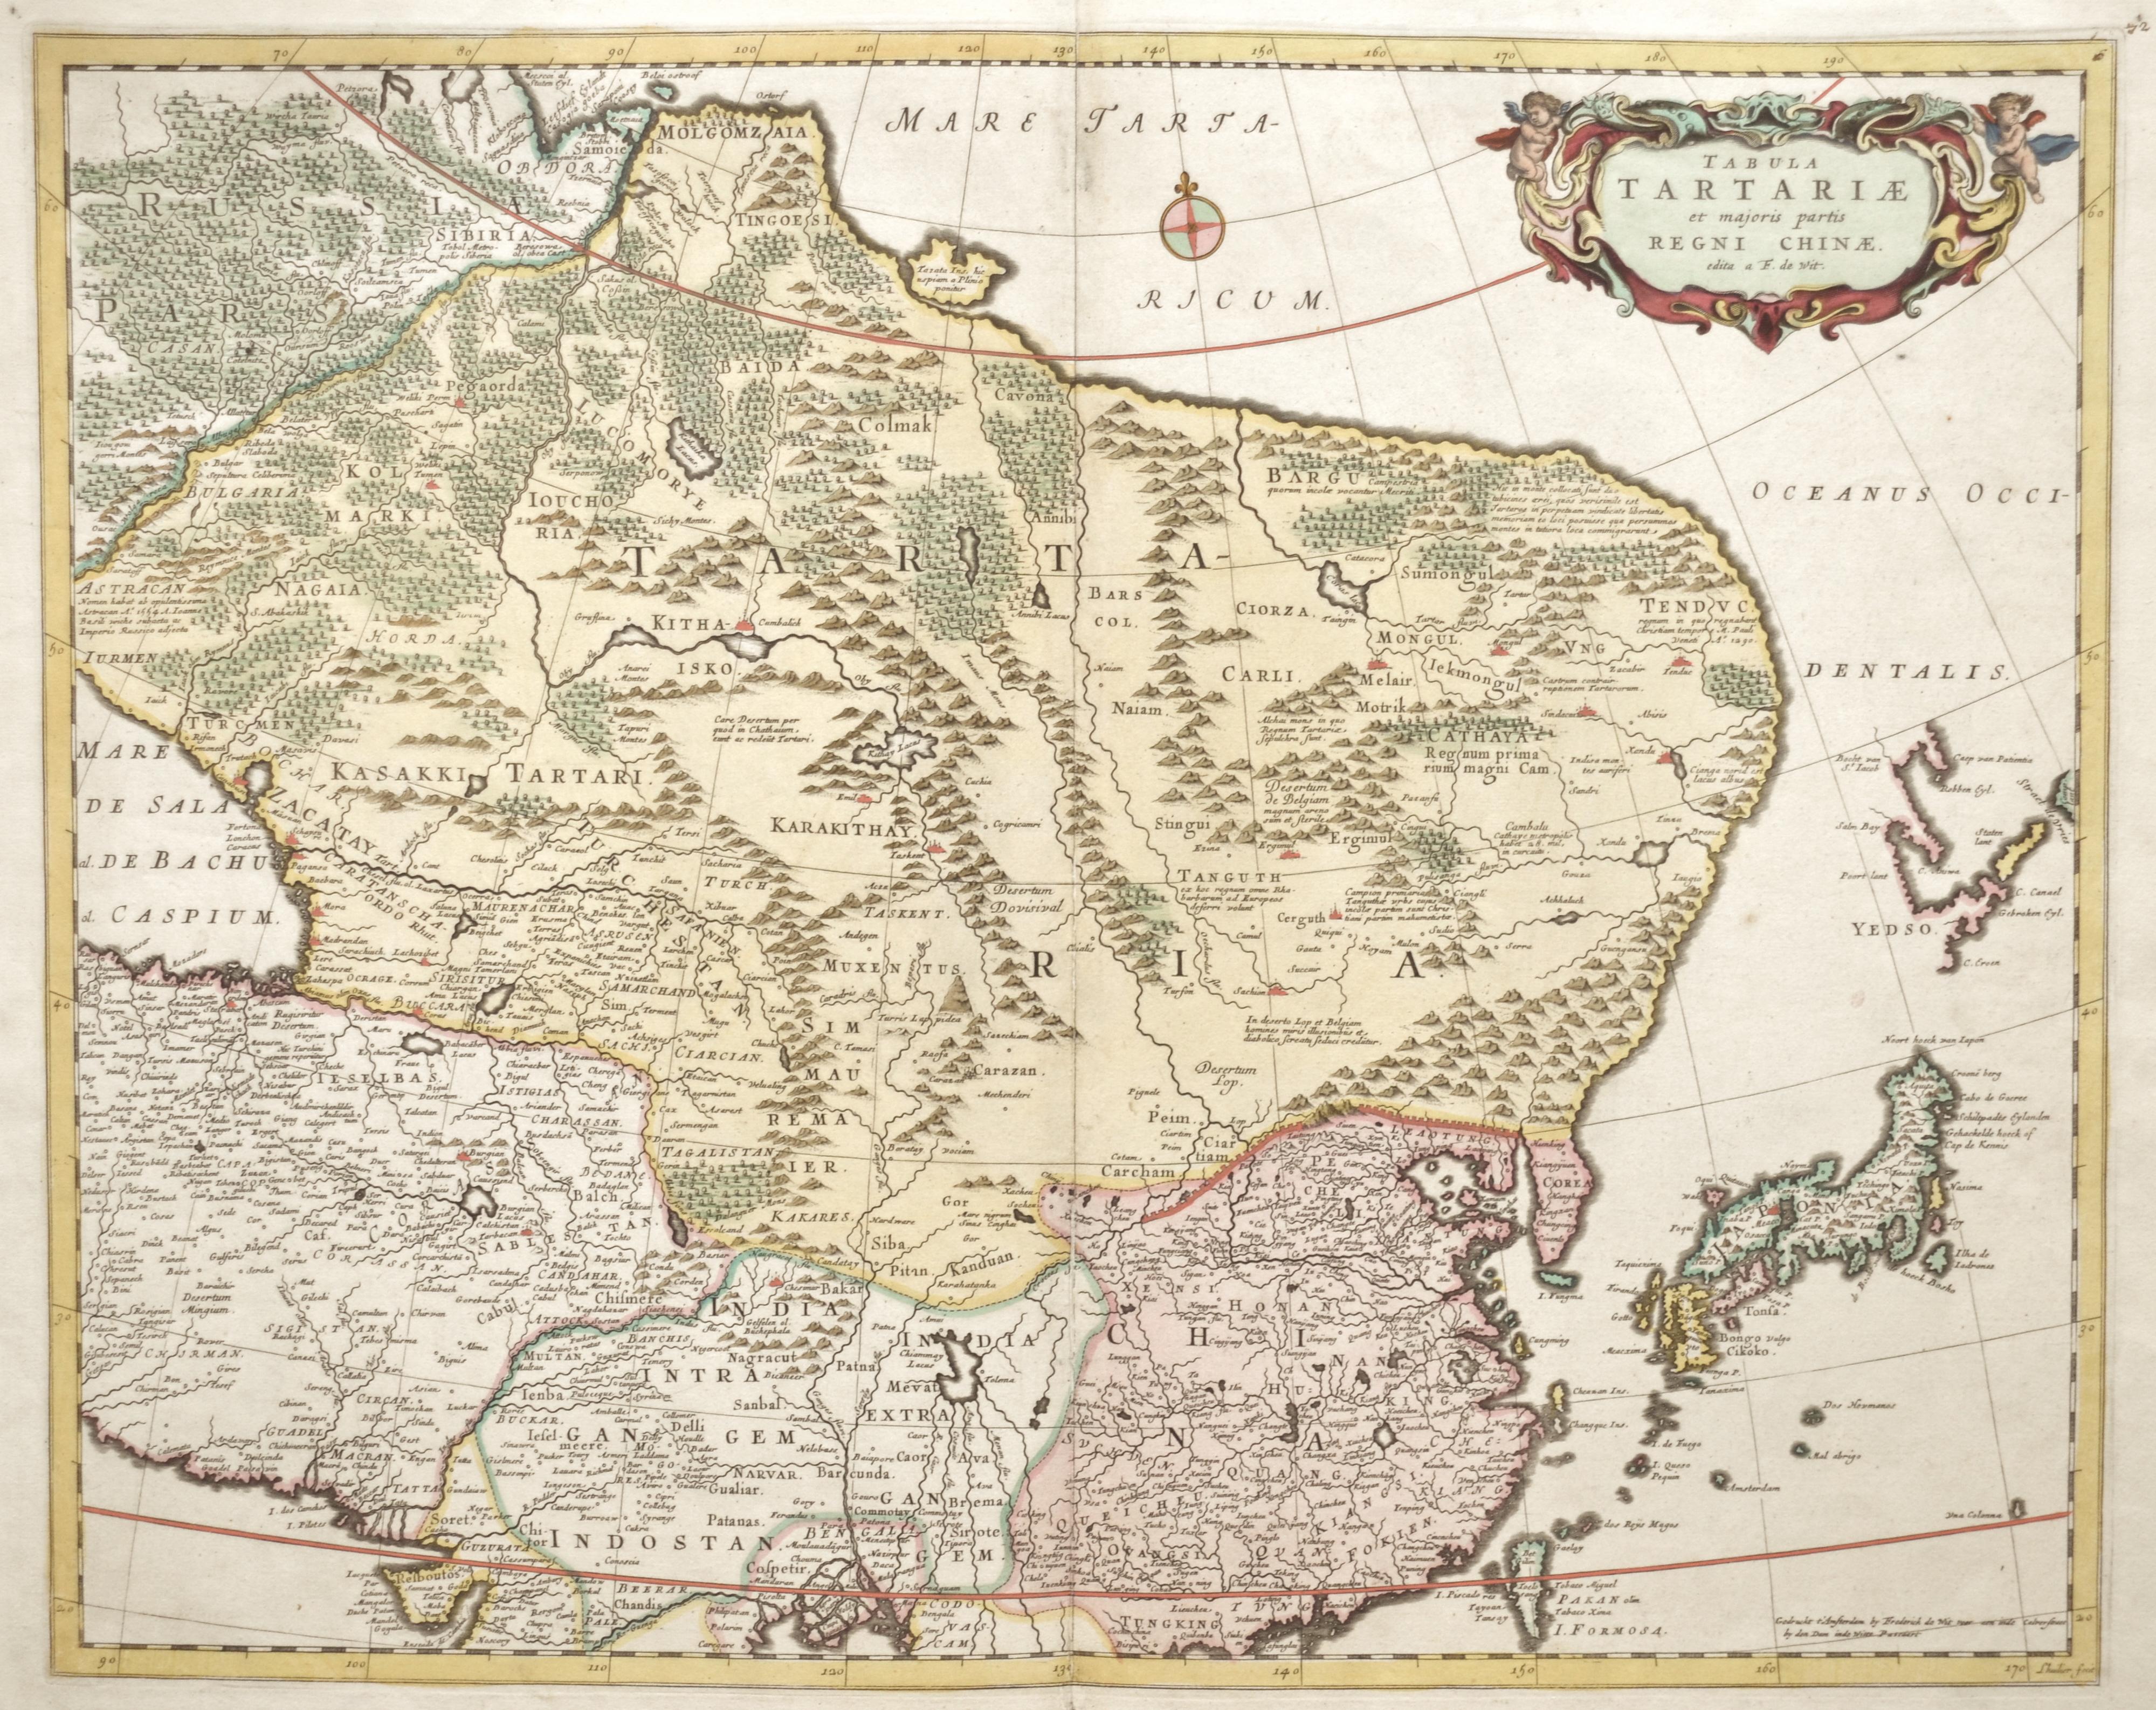 Wit, de Frederick Tabula Tartariae et majoris partis Regni Chinae.